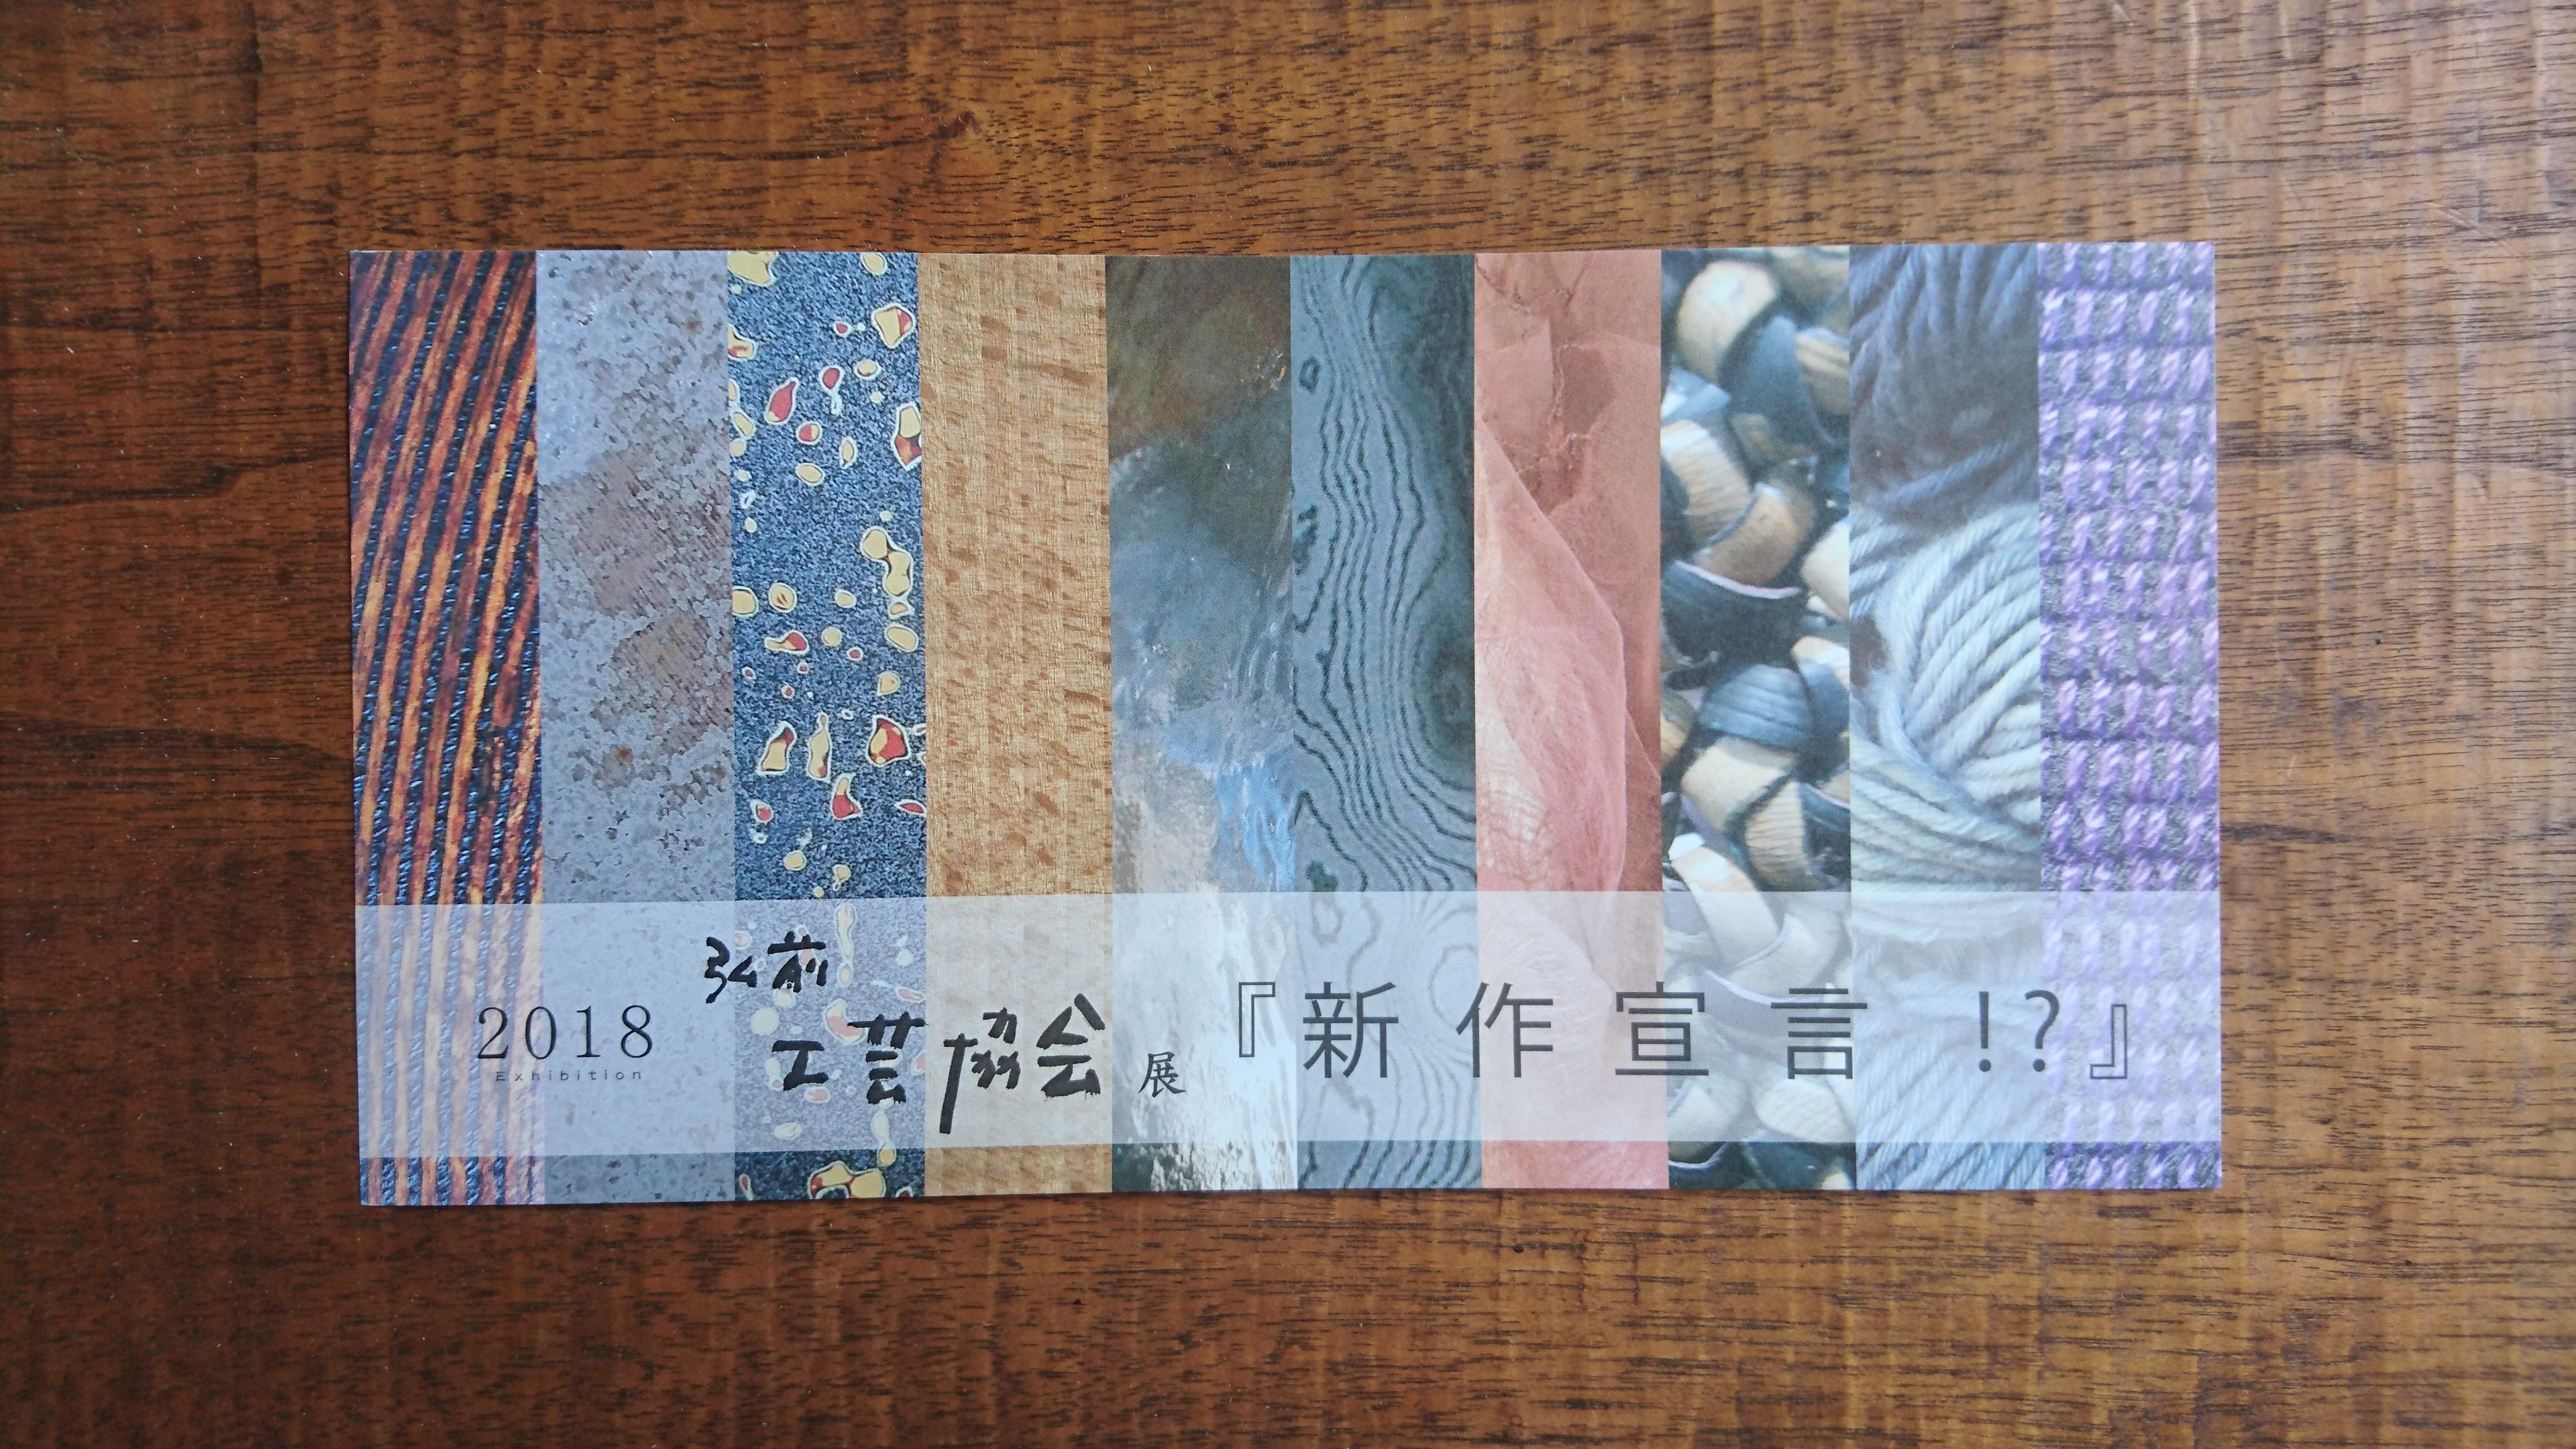 dairoku 2018 6 Hirosaki kougei